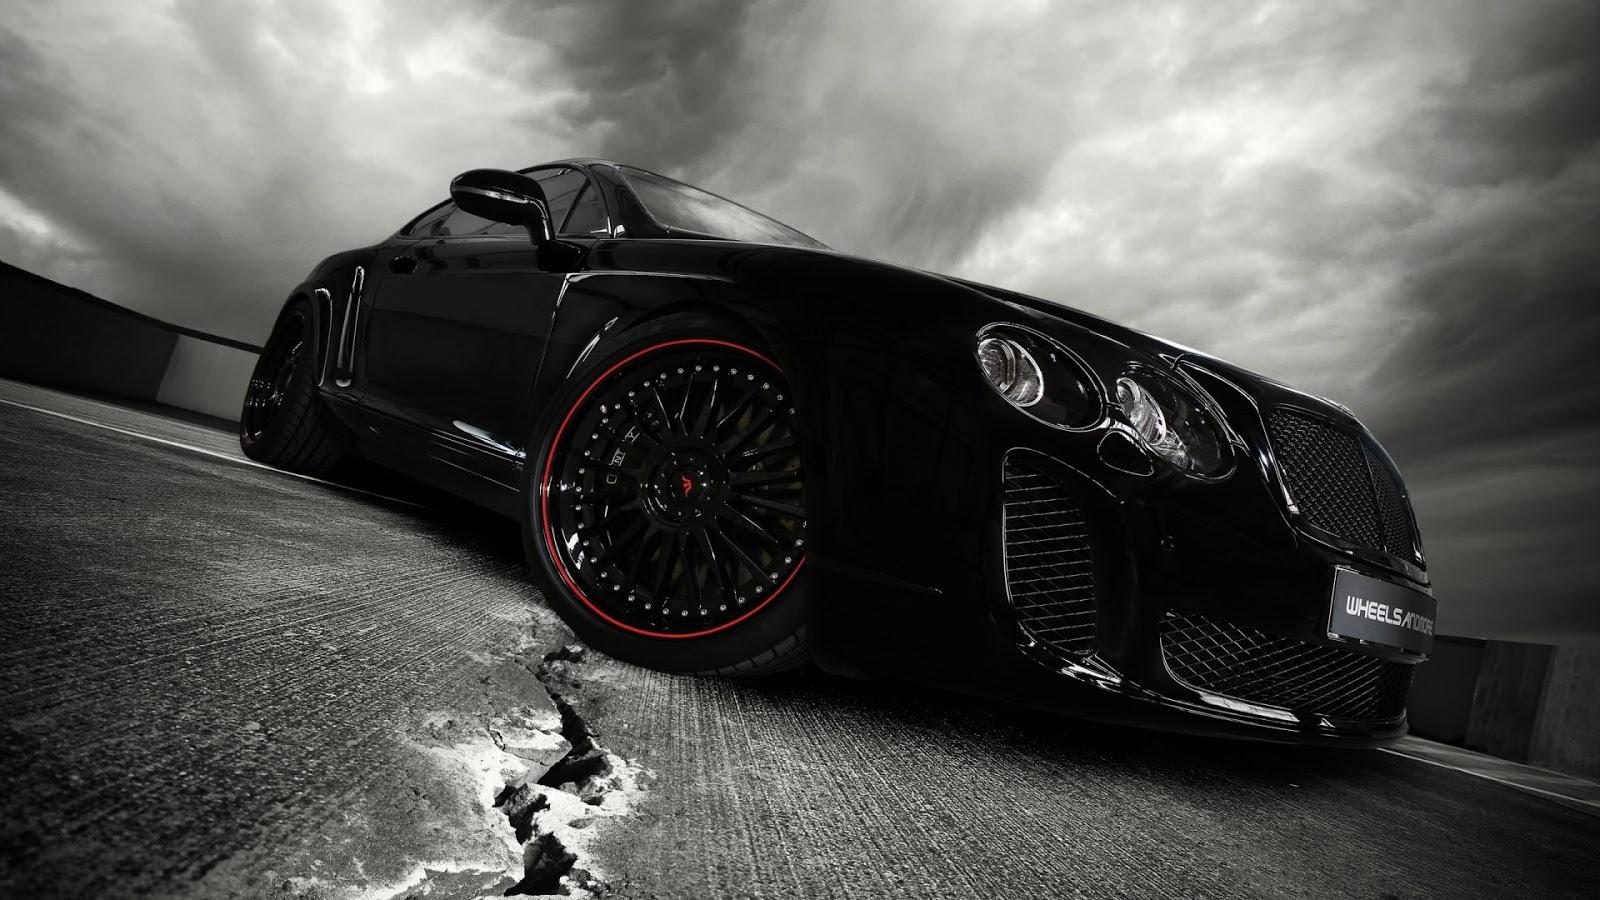 100 Wallpaper Black Hd Car HD